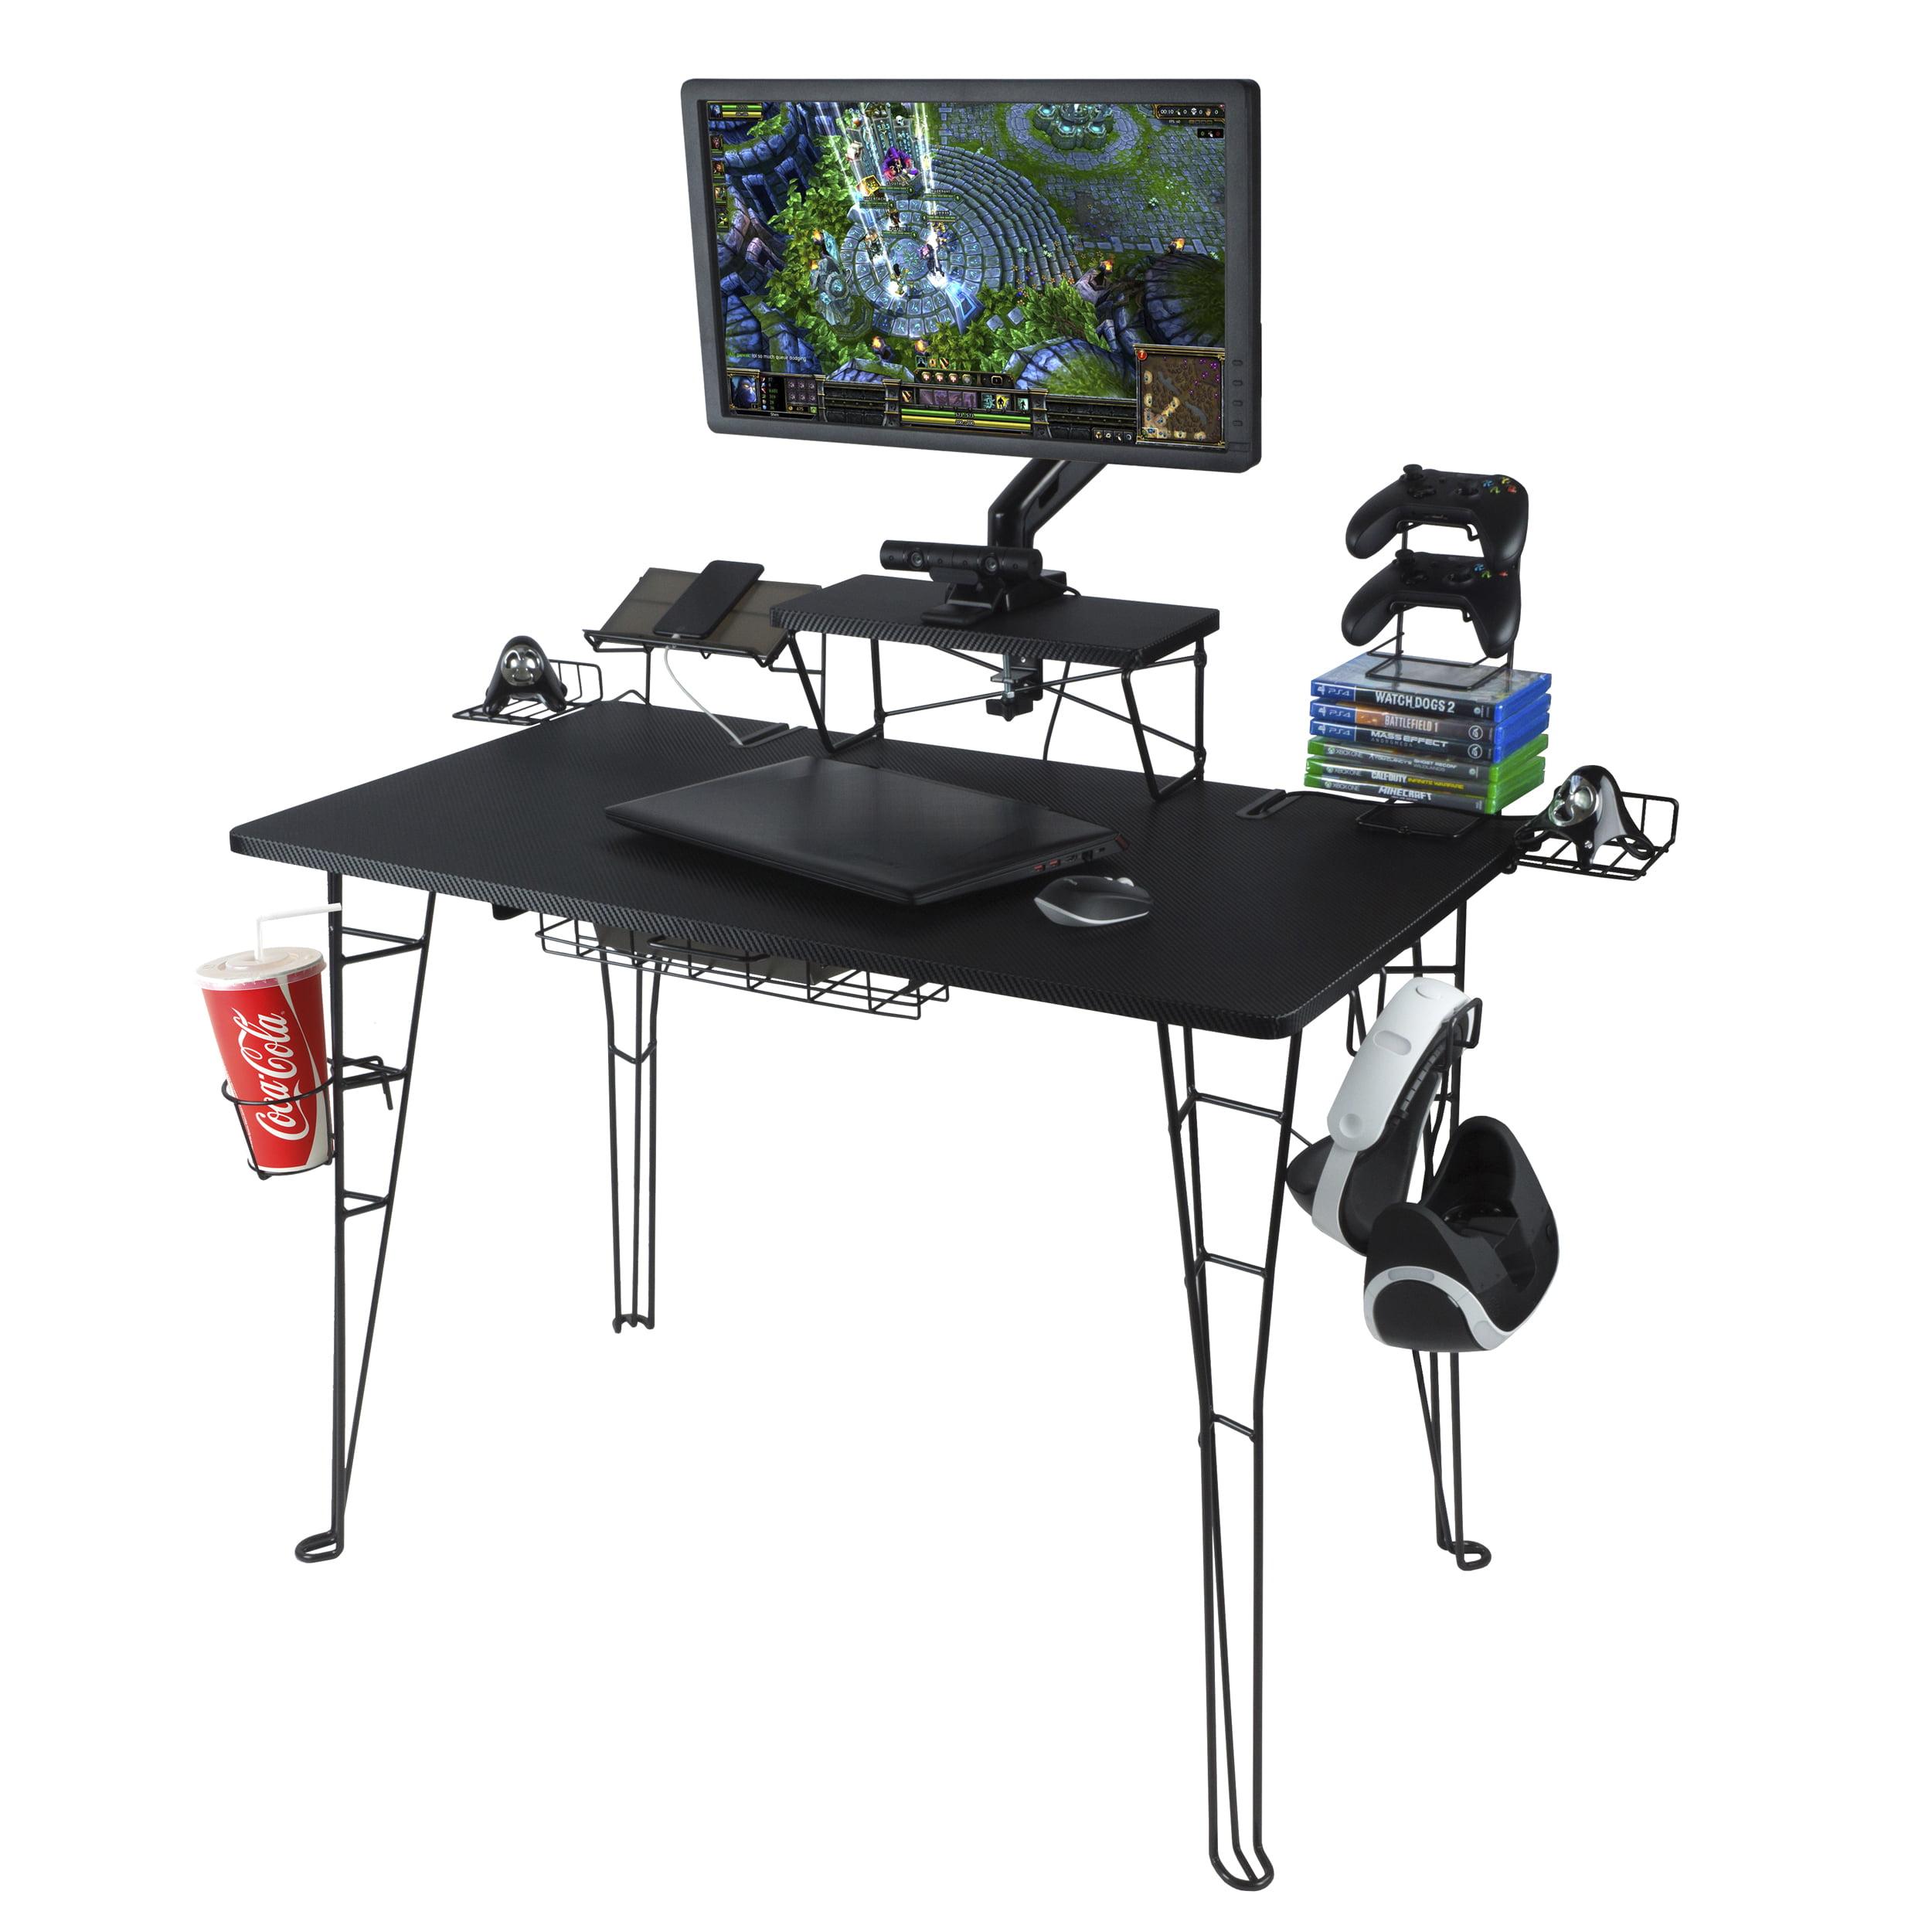 Atlantic Original Gaming Desk With 32 Monitor Stand Charging Station And Gaming Storage Black Carbon Fiber Walmart Com Walmart Com